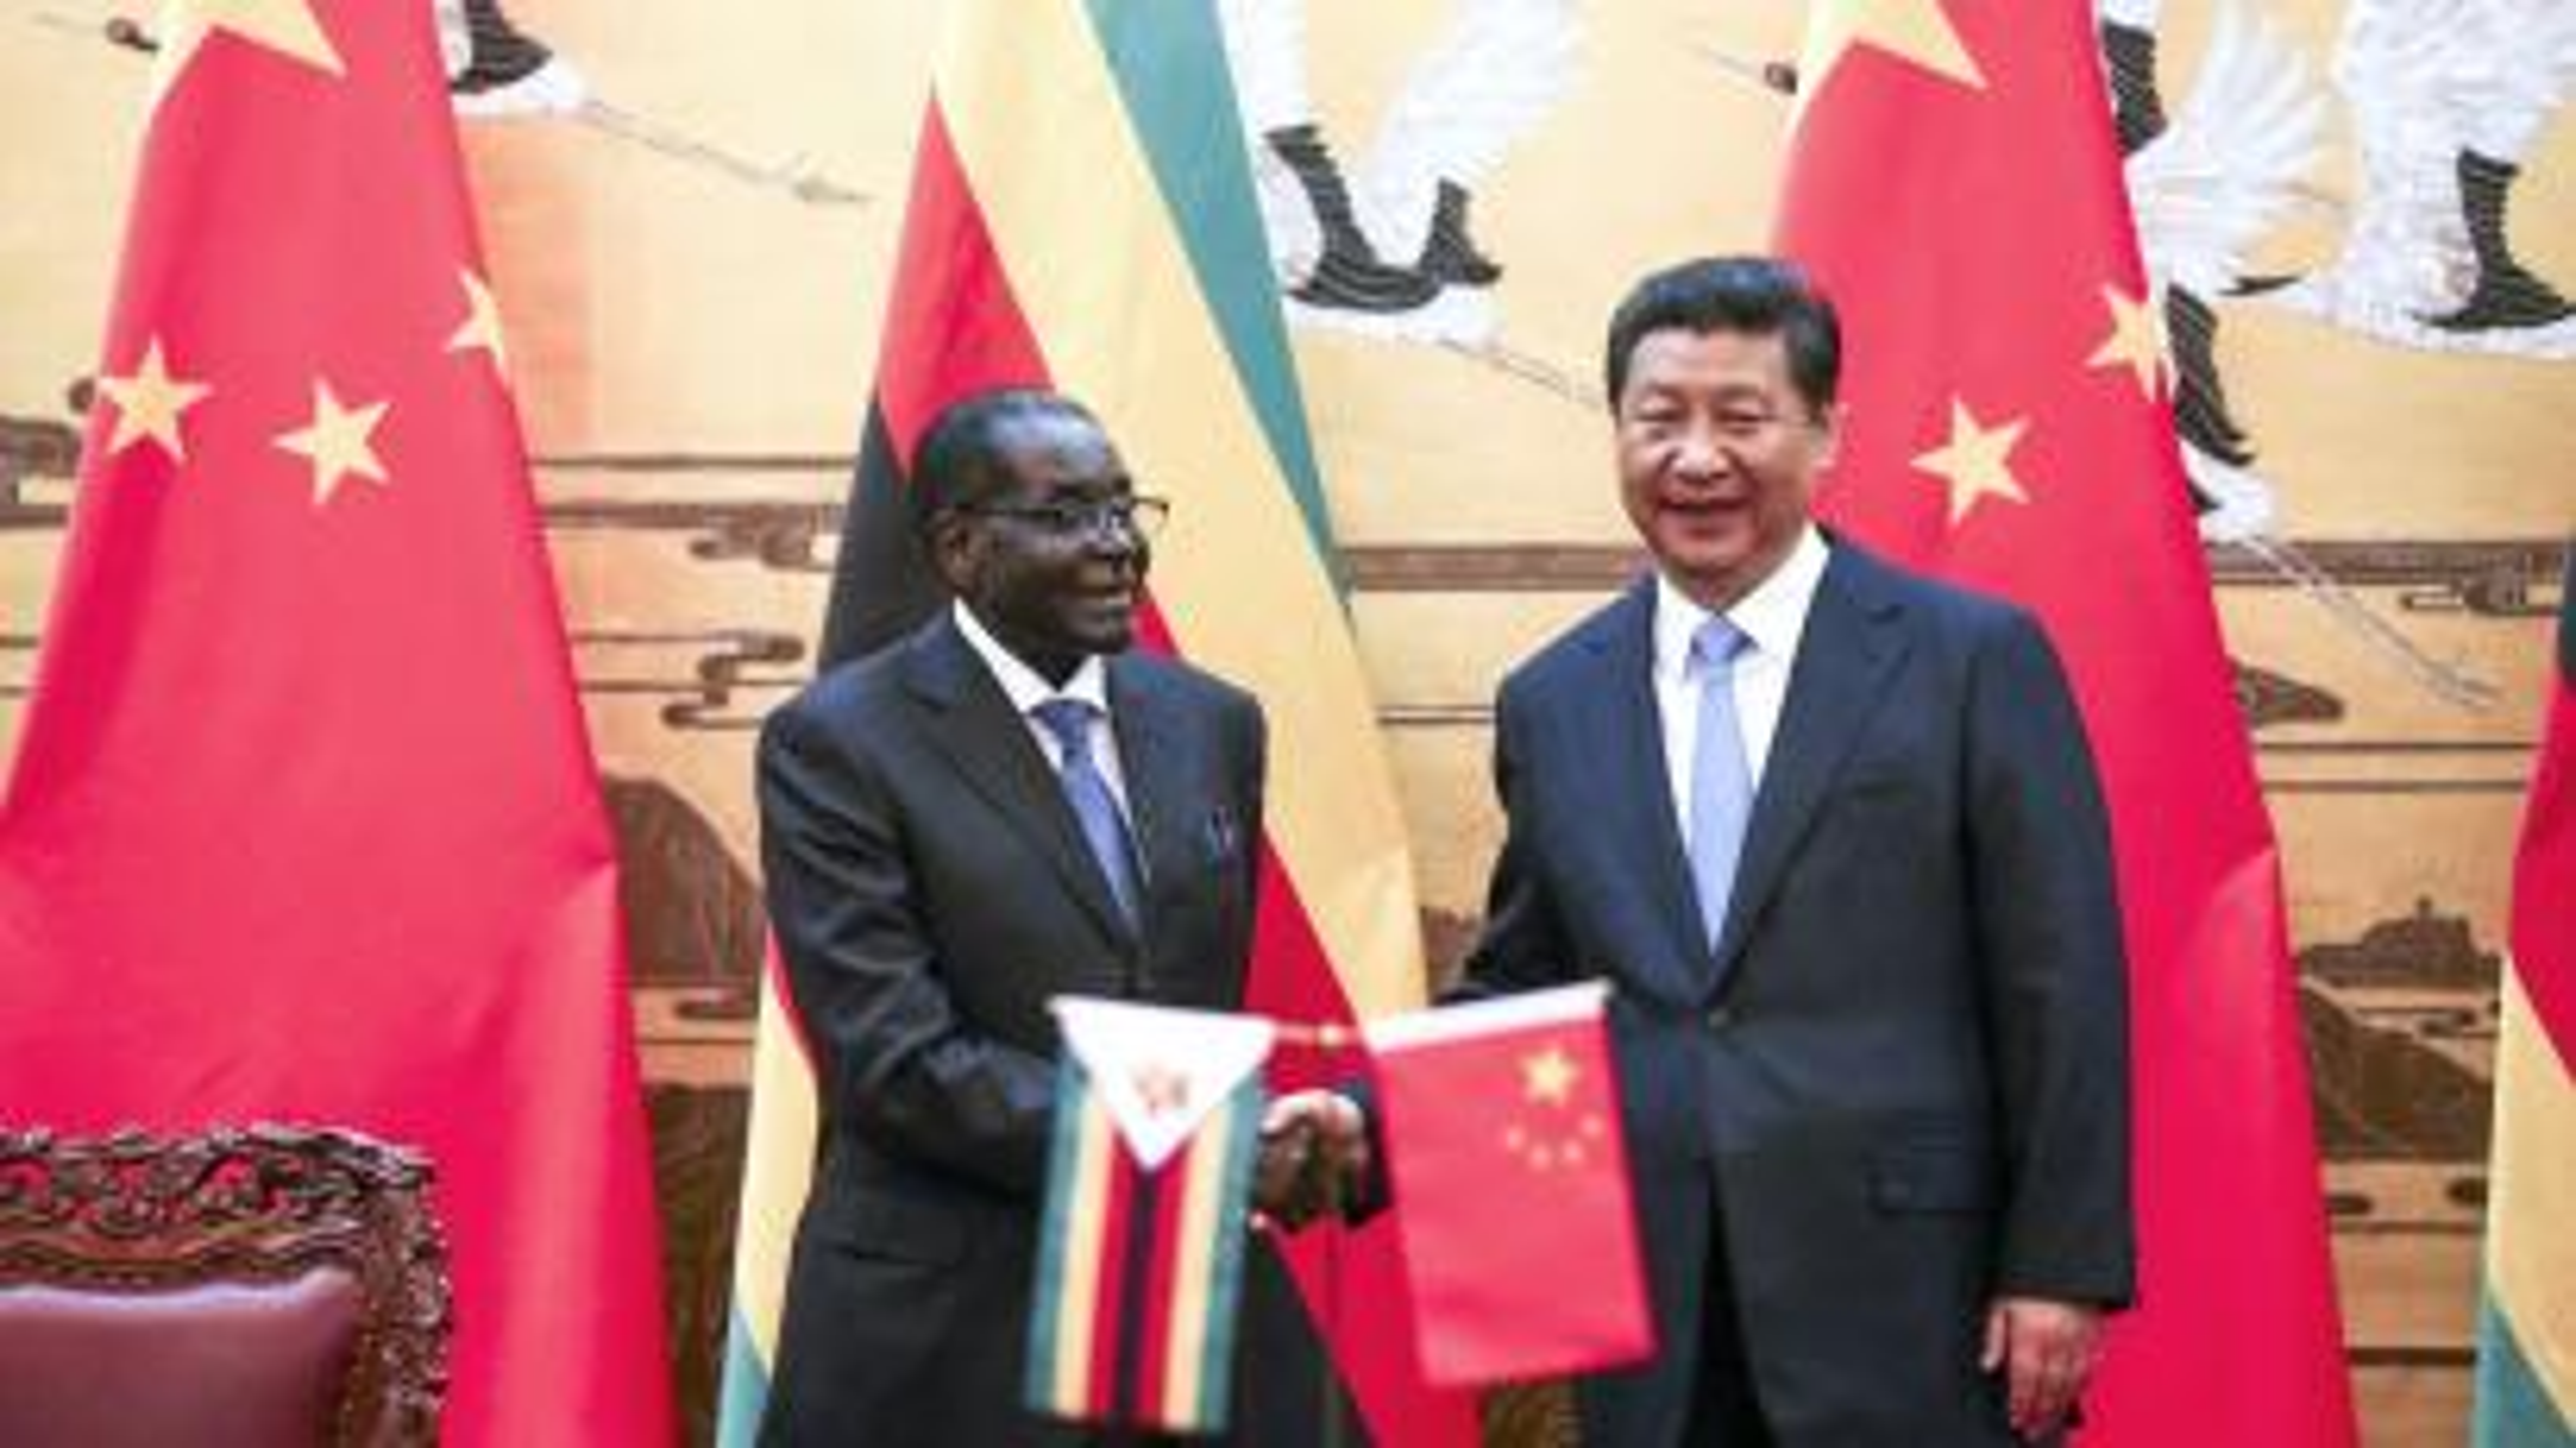 Mugabe and Xi